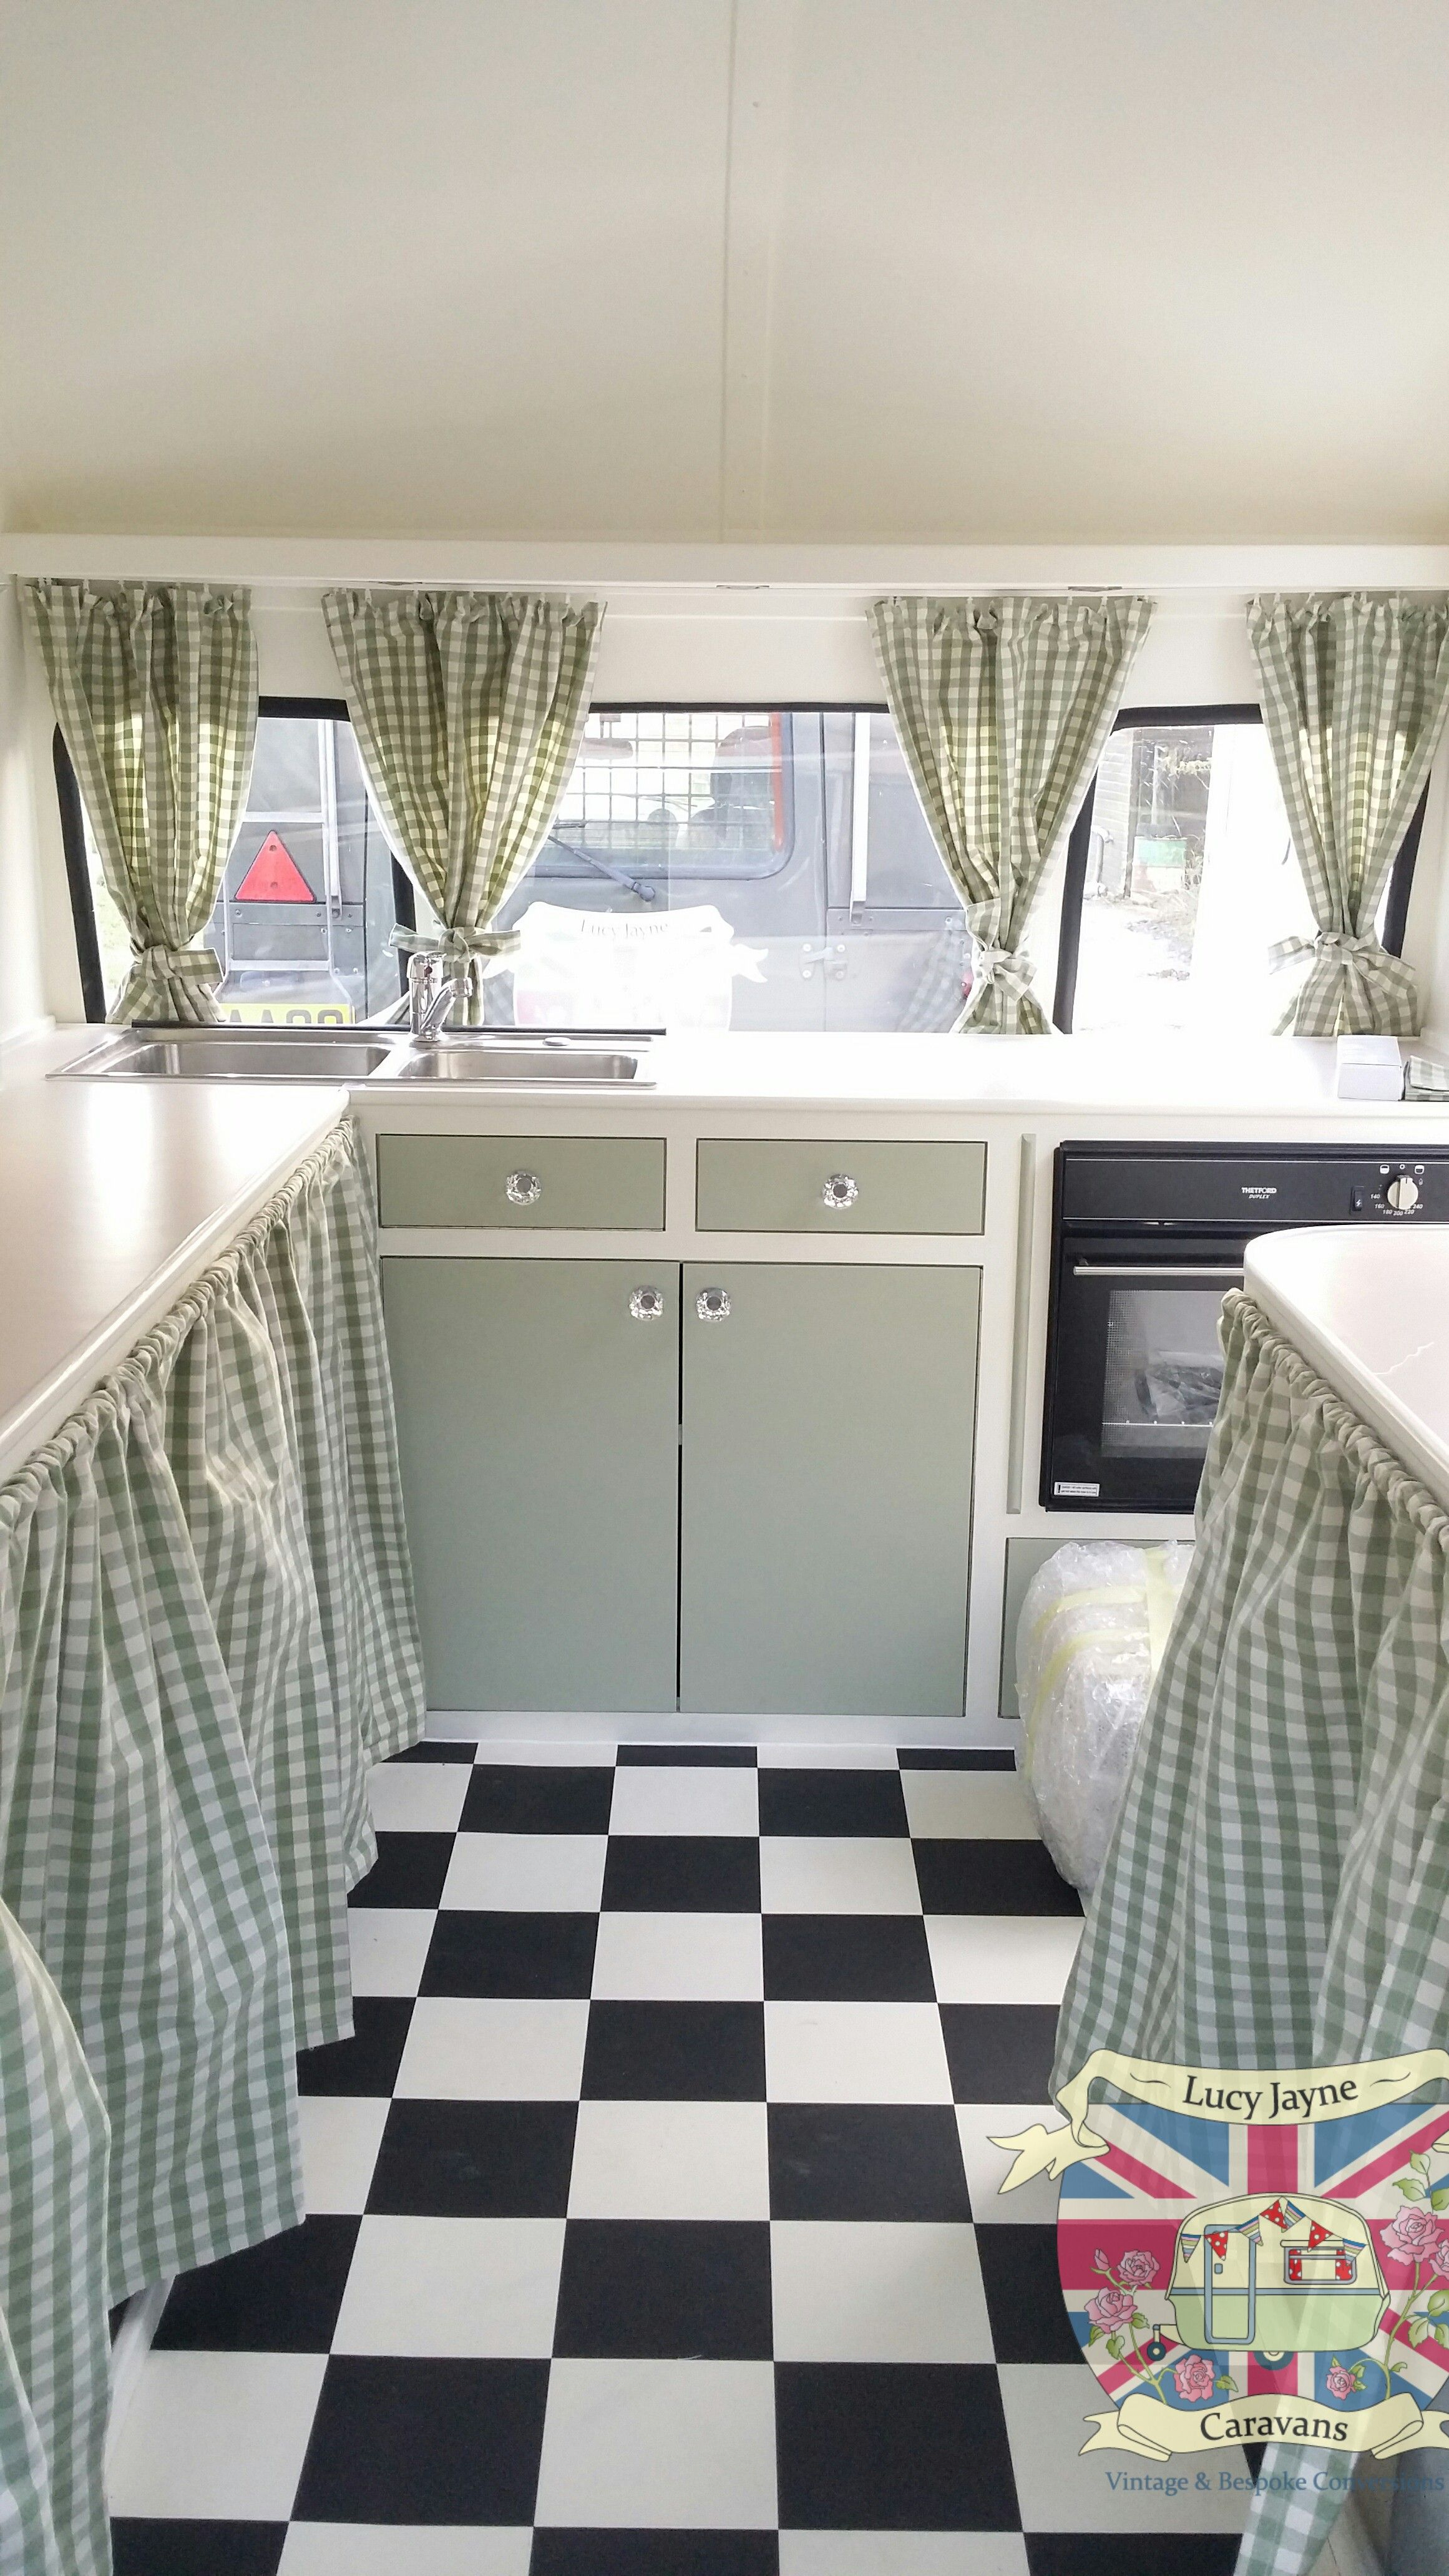 Vintage Caravan Bespoke Built Soft Catering Interior